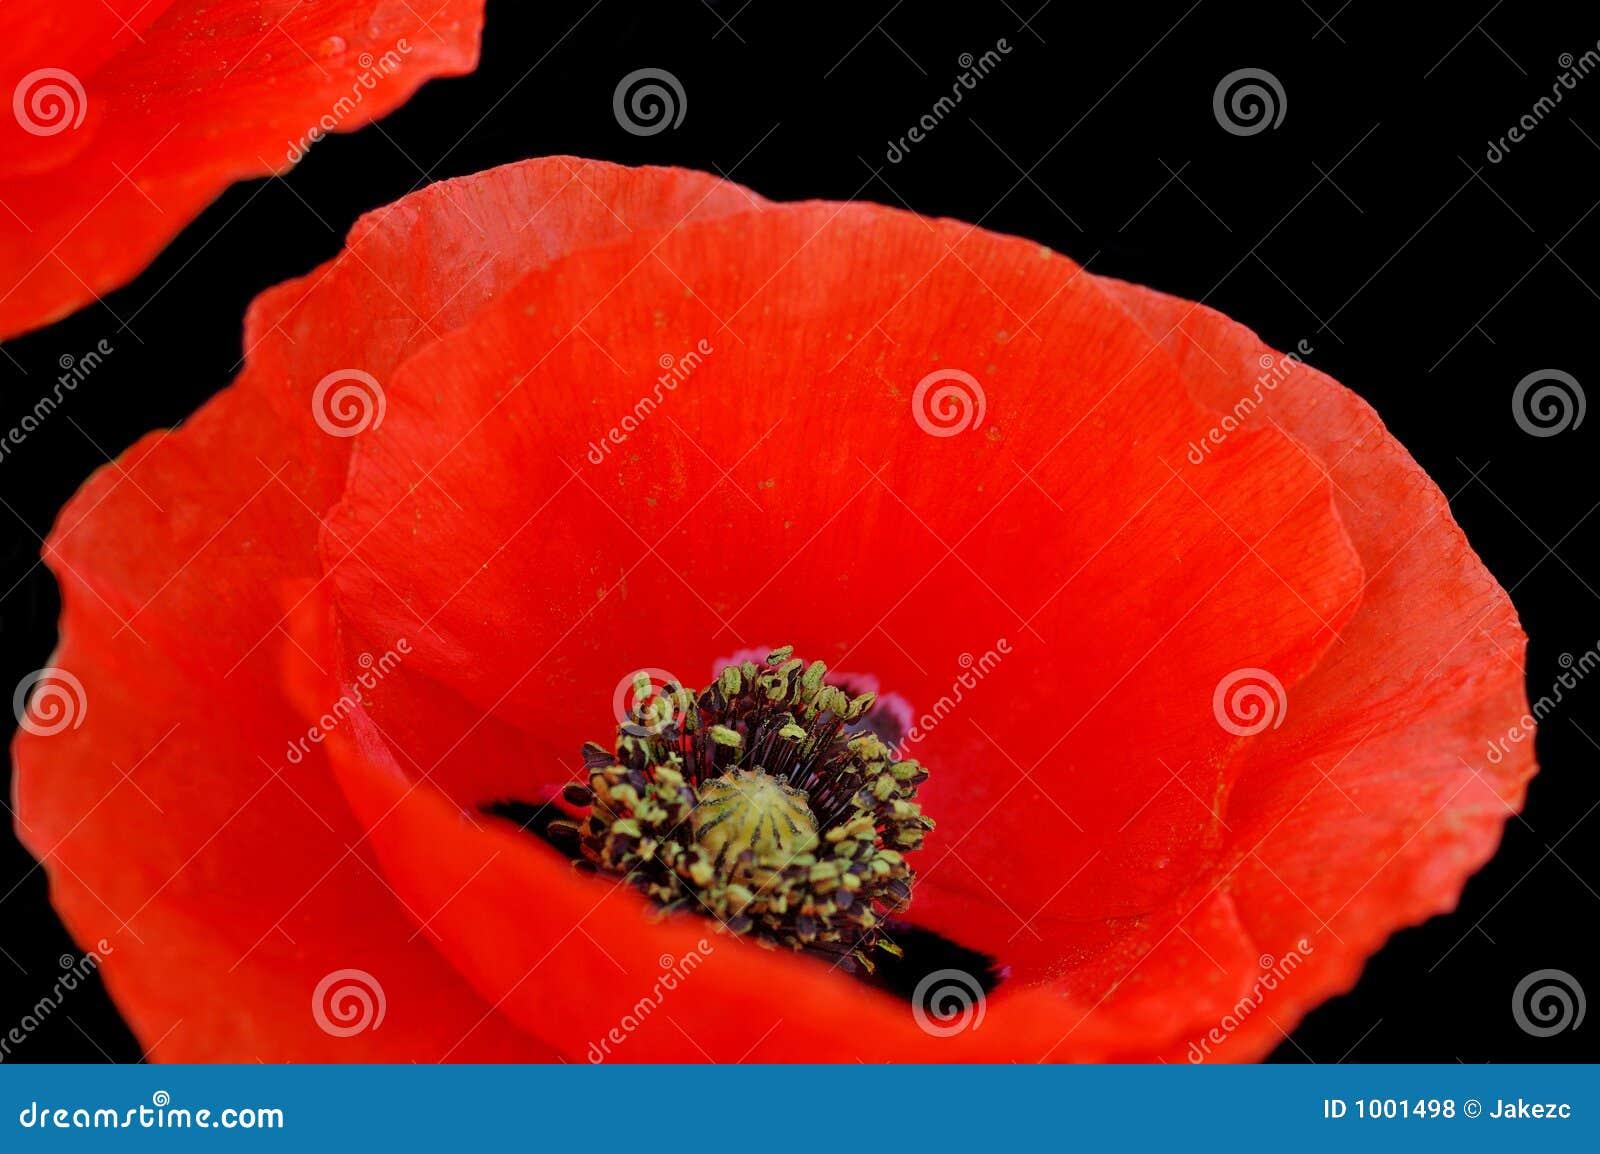 Poppy flower closeup